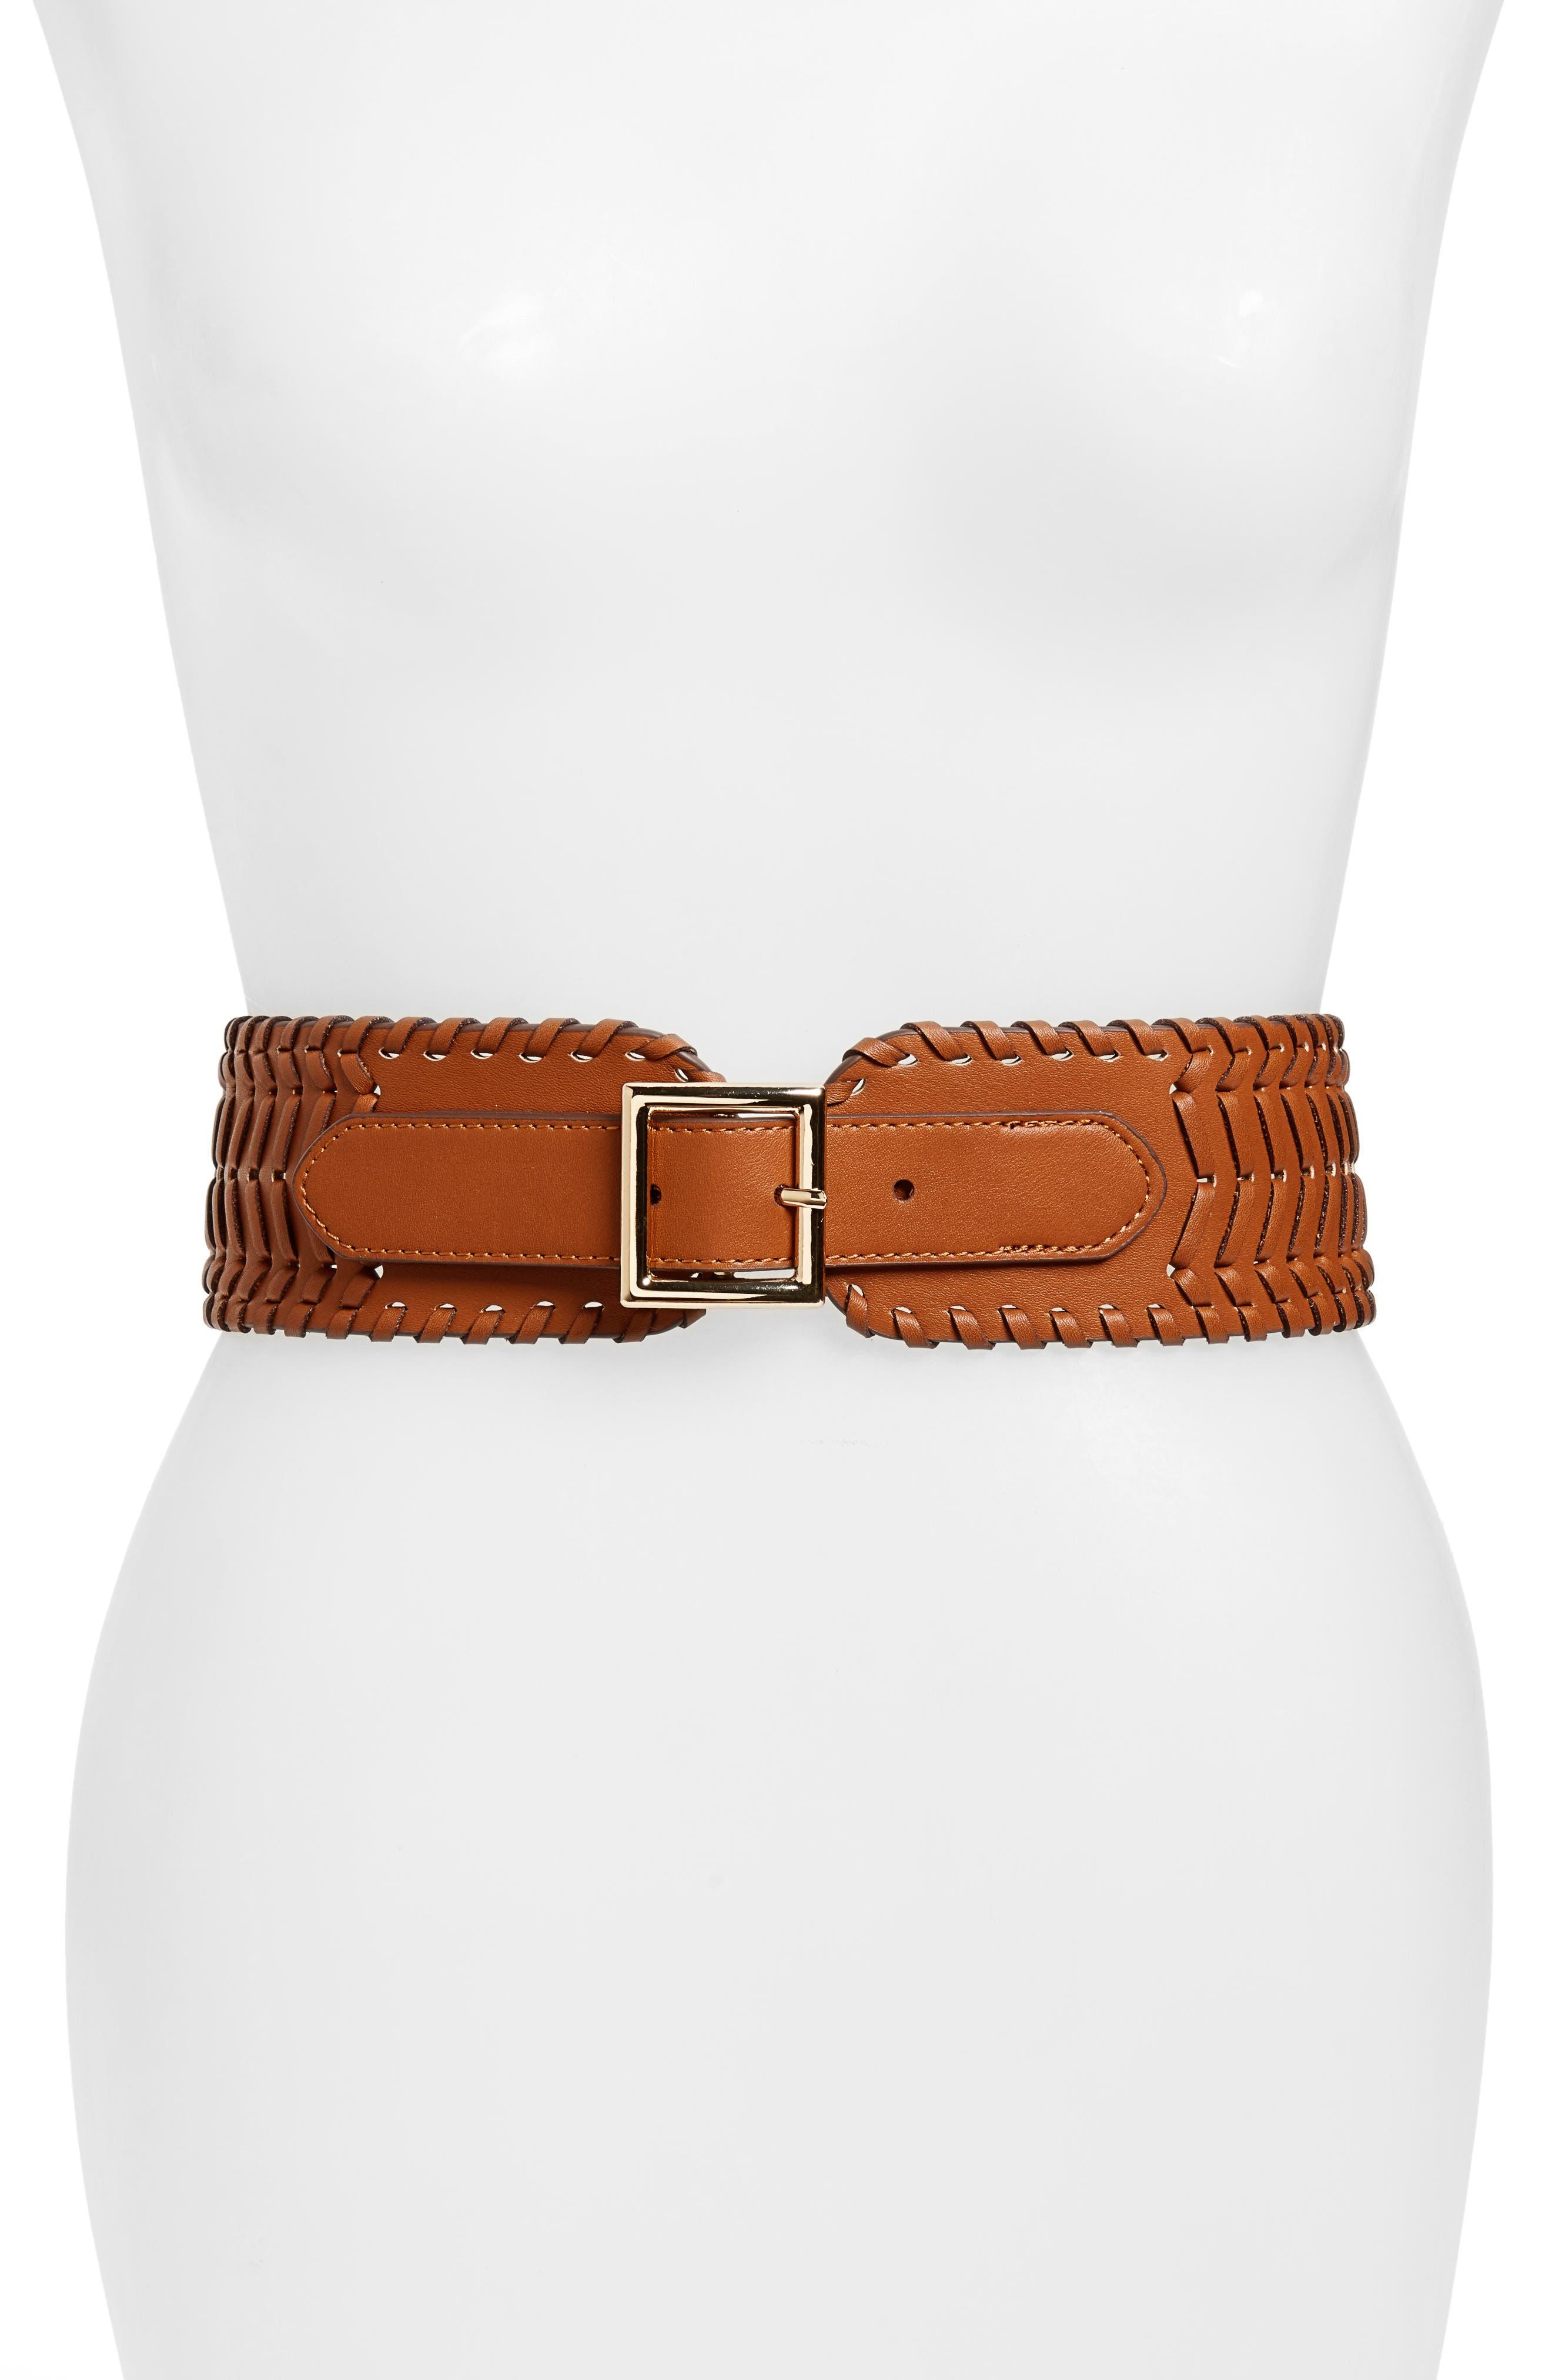 Treasure & Bond Whipstitch Stretch Belt